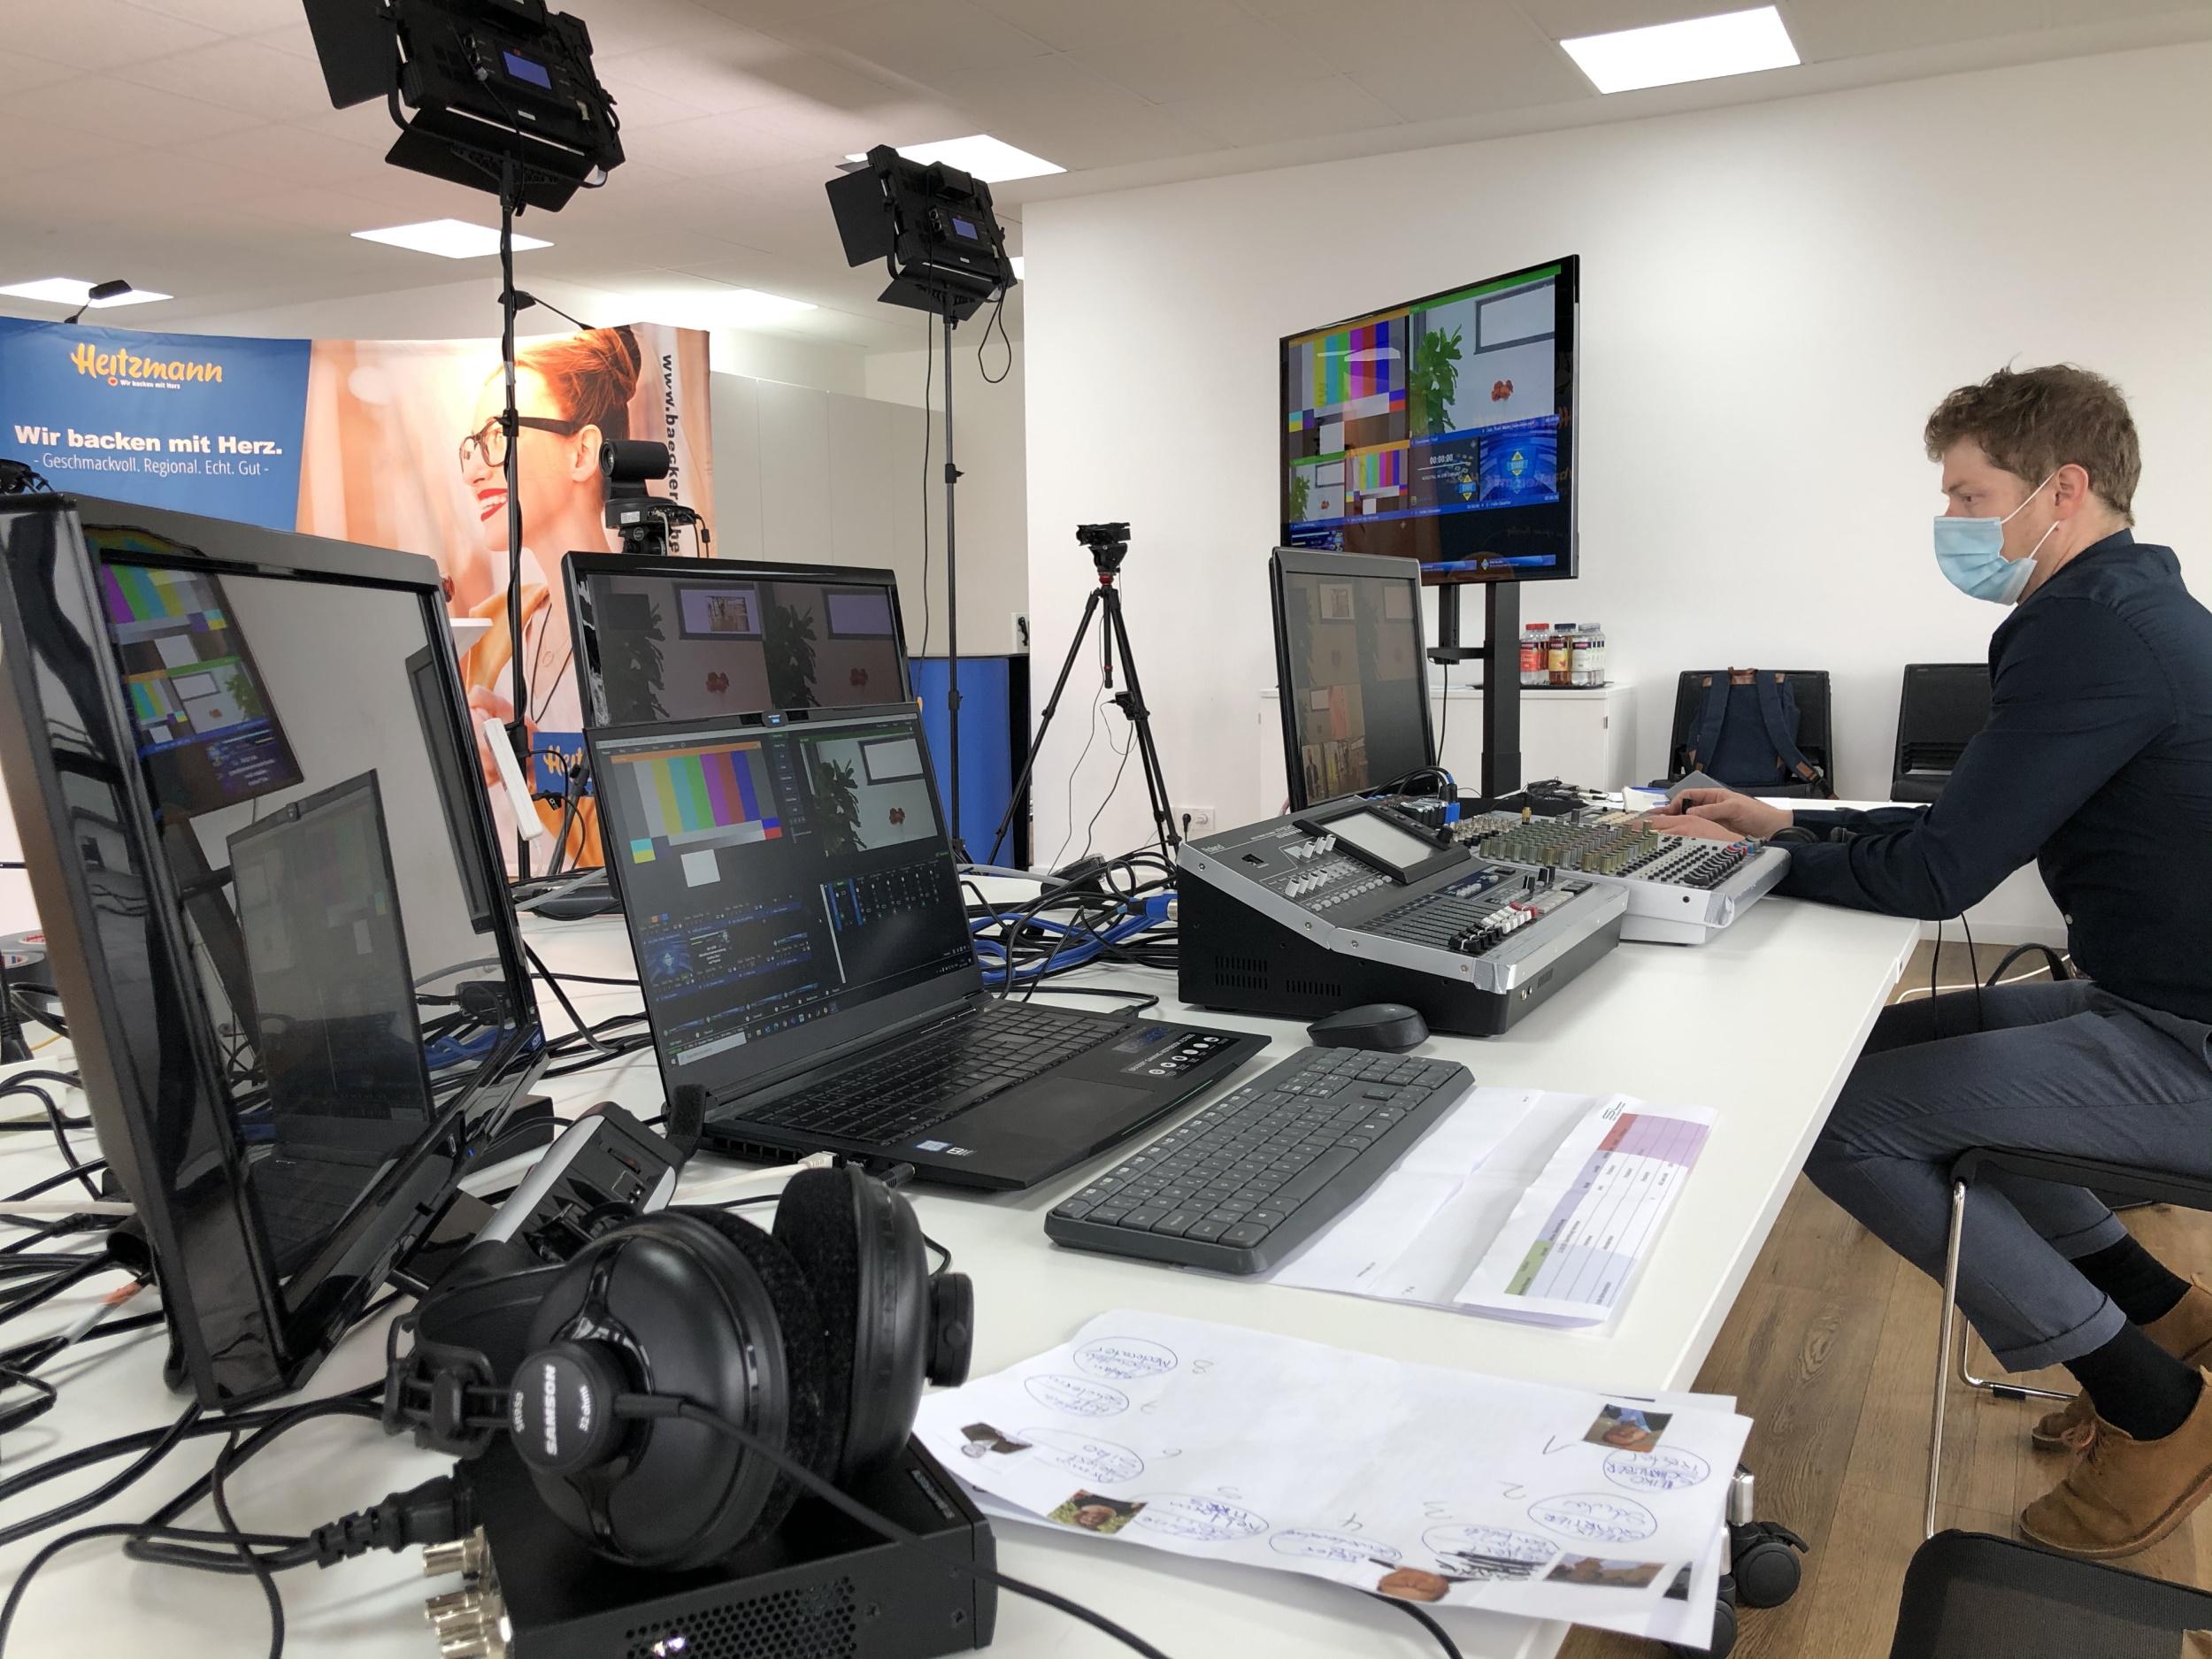 Live Streaming Podiumsdiskussion JobStartMarkt 2